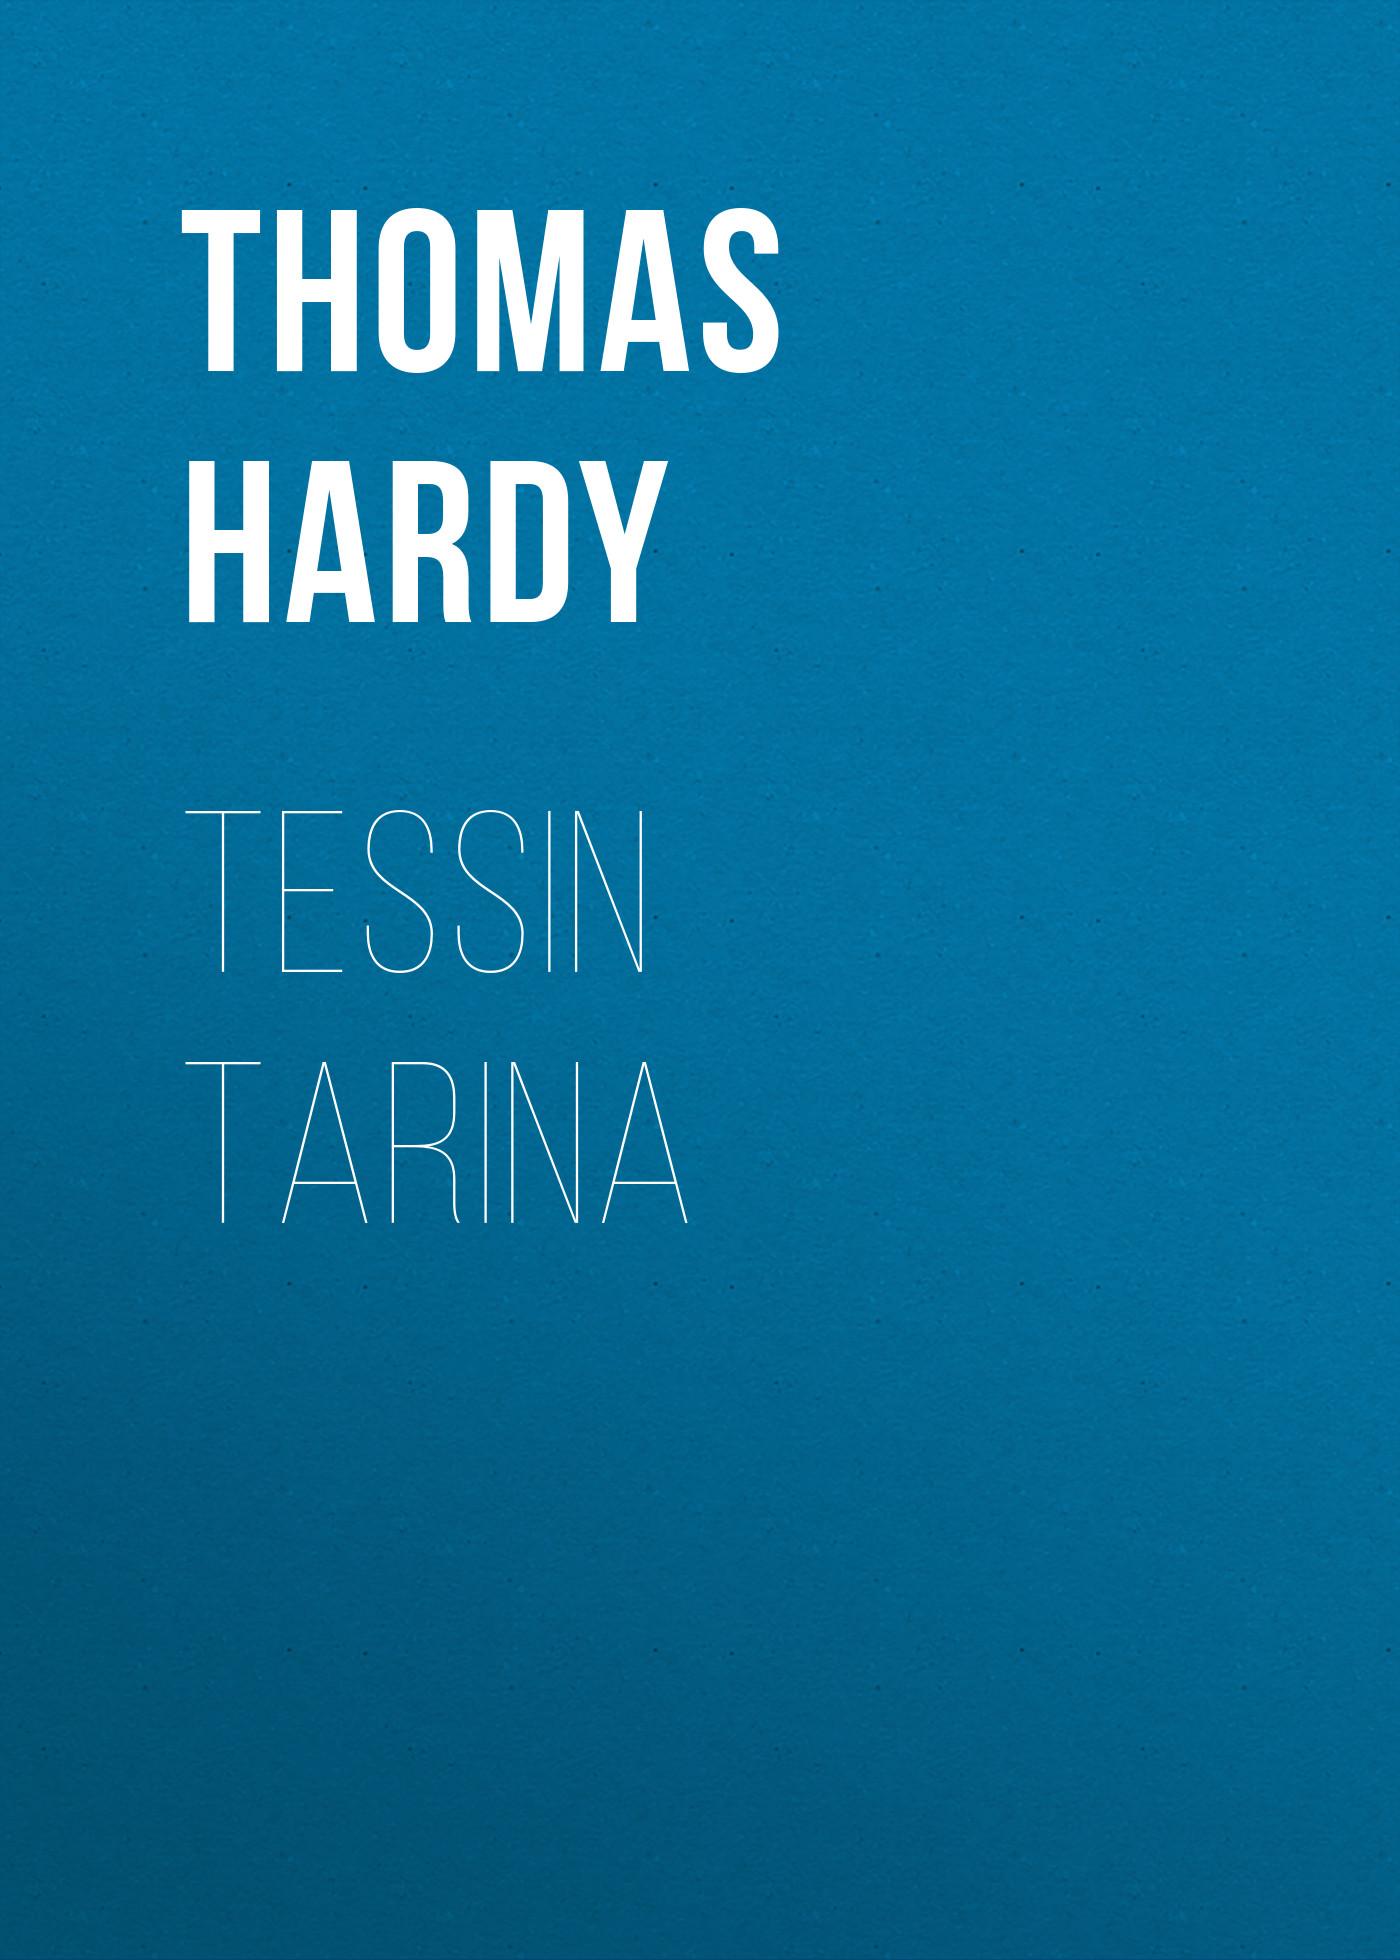 Thomas Hardy Tessin tarina thomas hardy life's little ironies